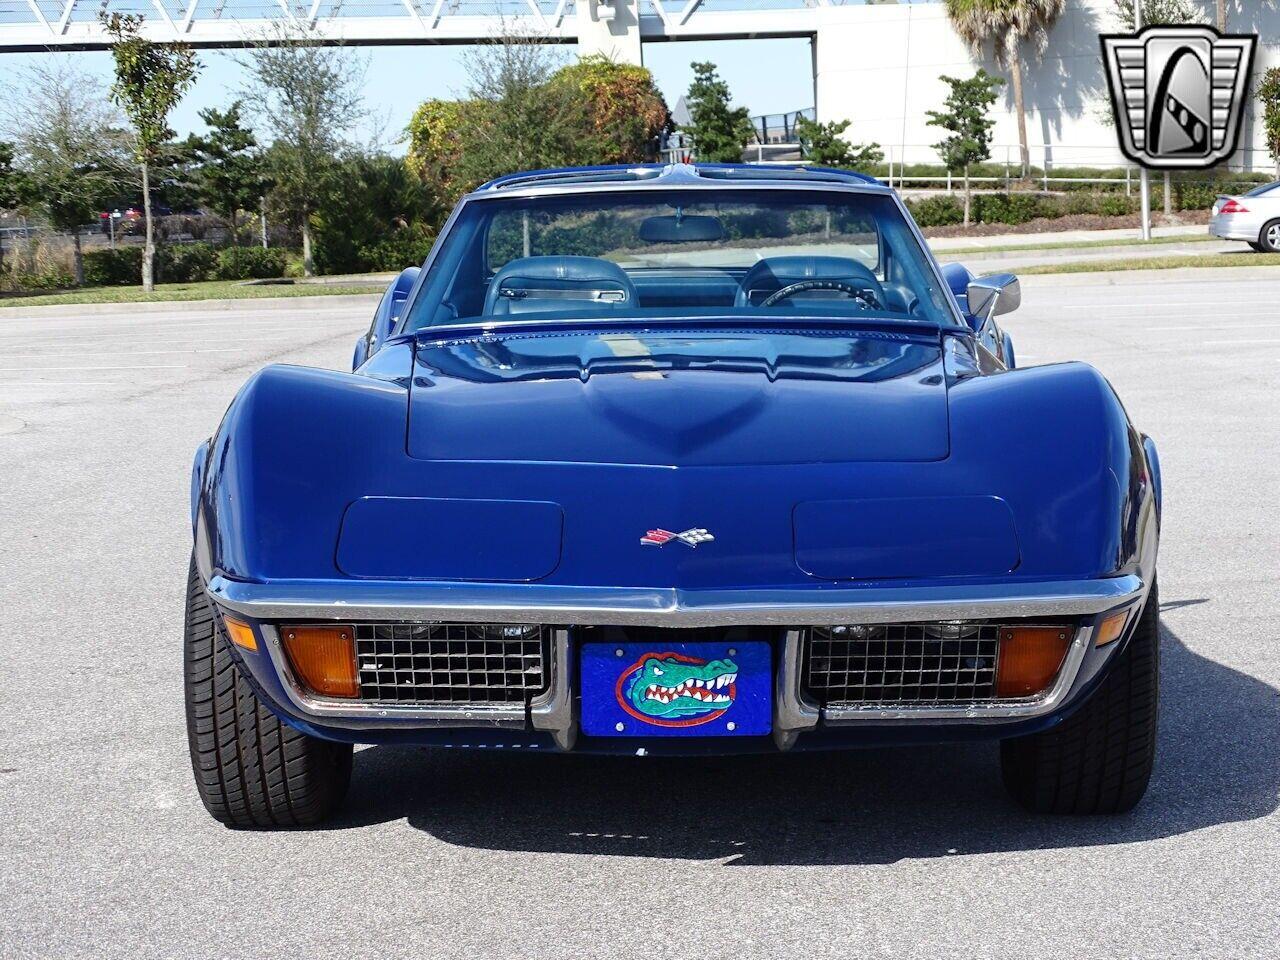 1972 Blue Chevrolet Corvette Stingray  | C3 Corvette Photo 4